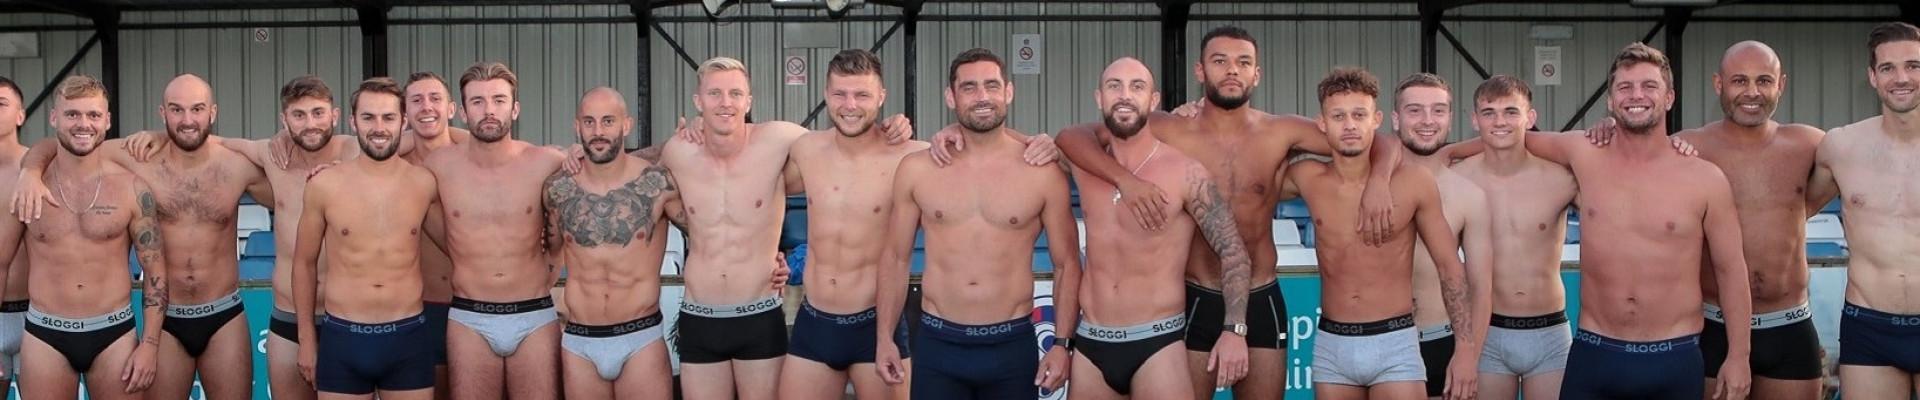 Team Photo 2019/20 Season